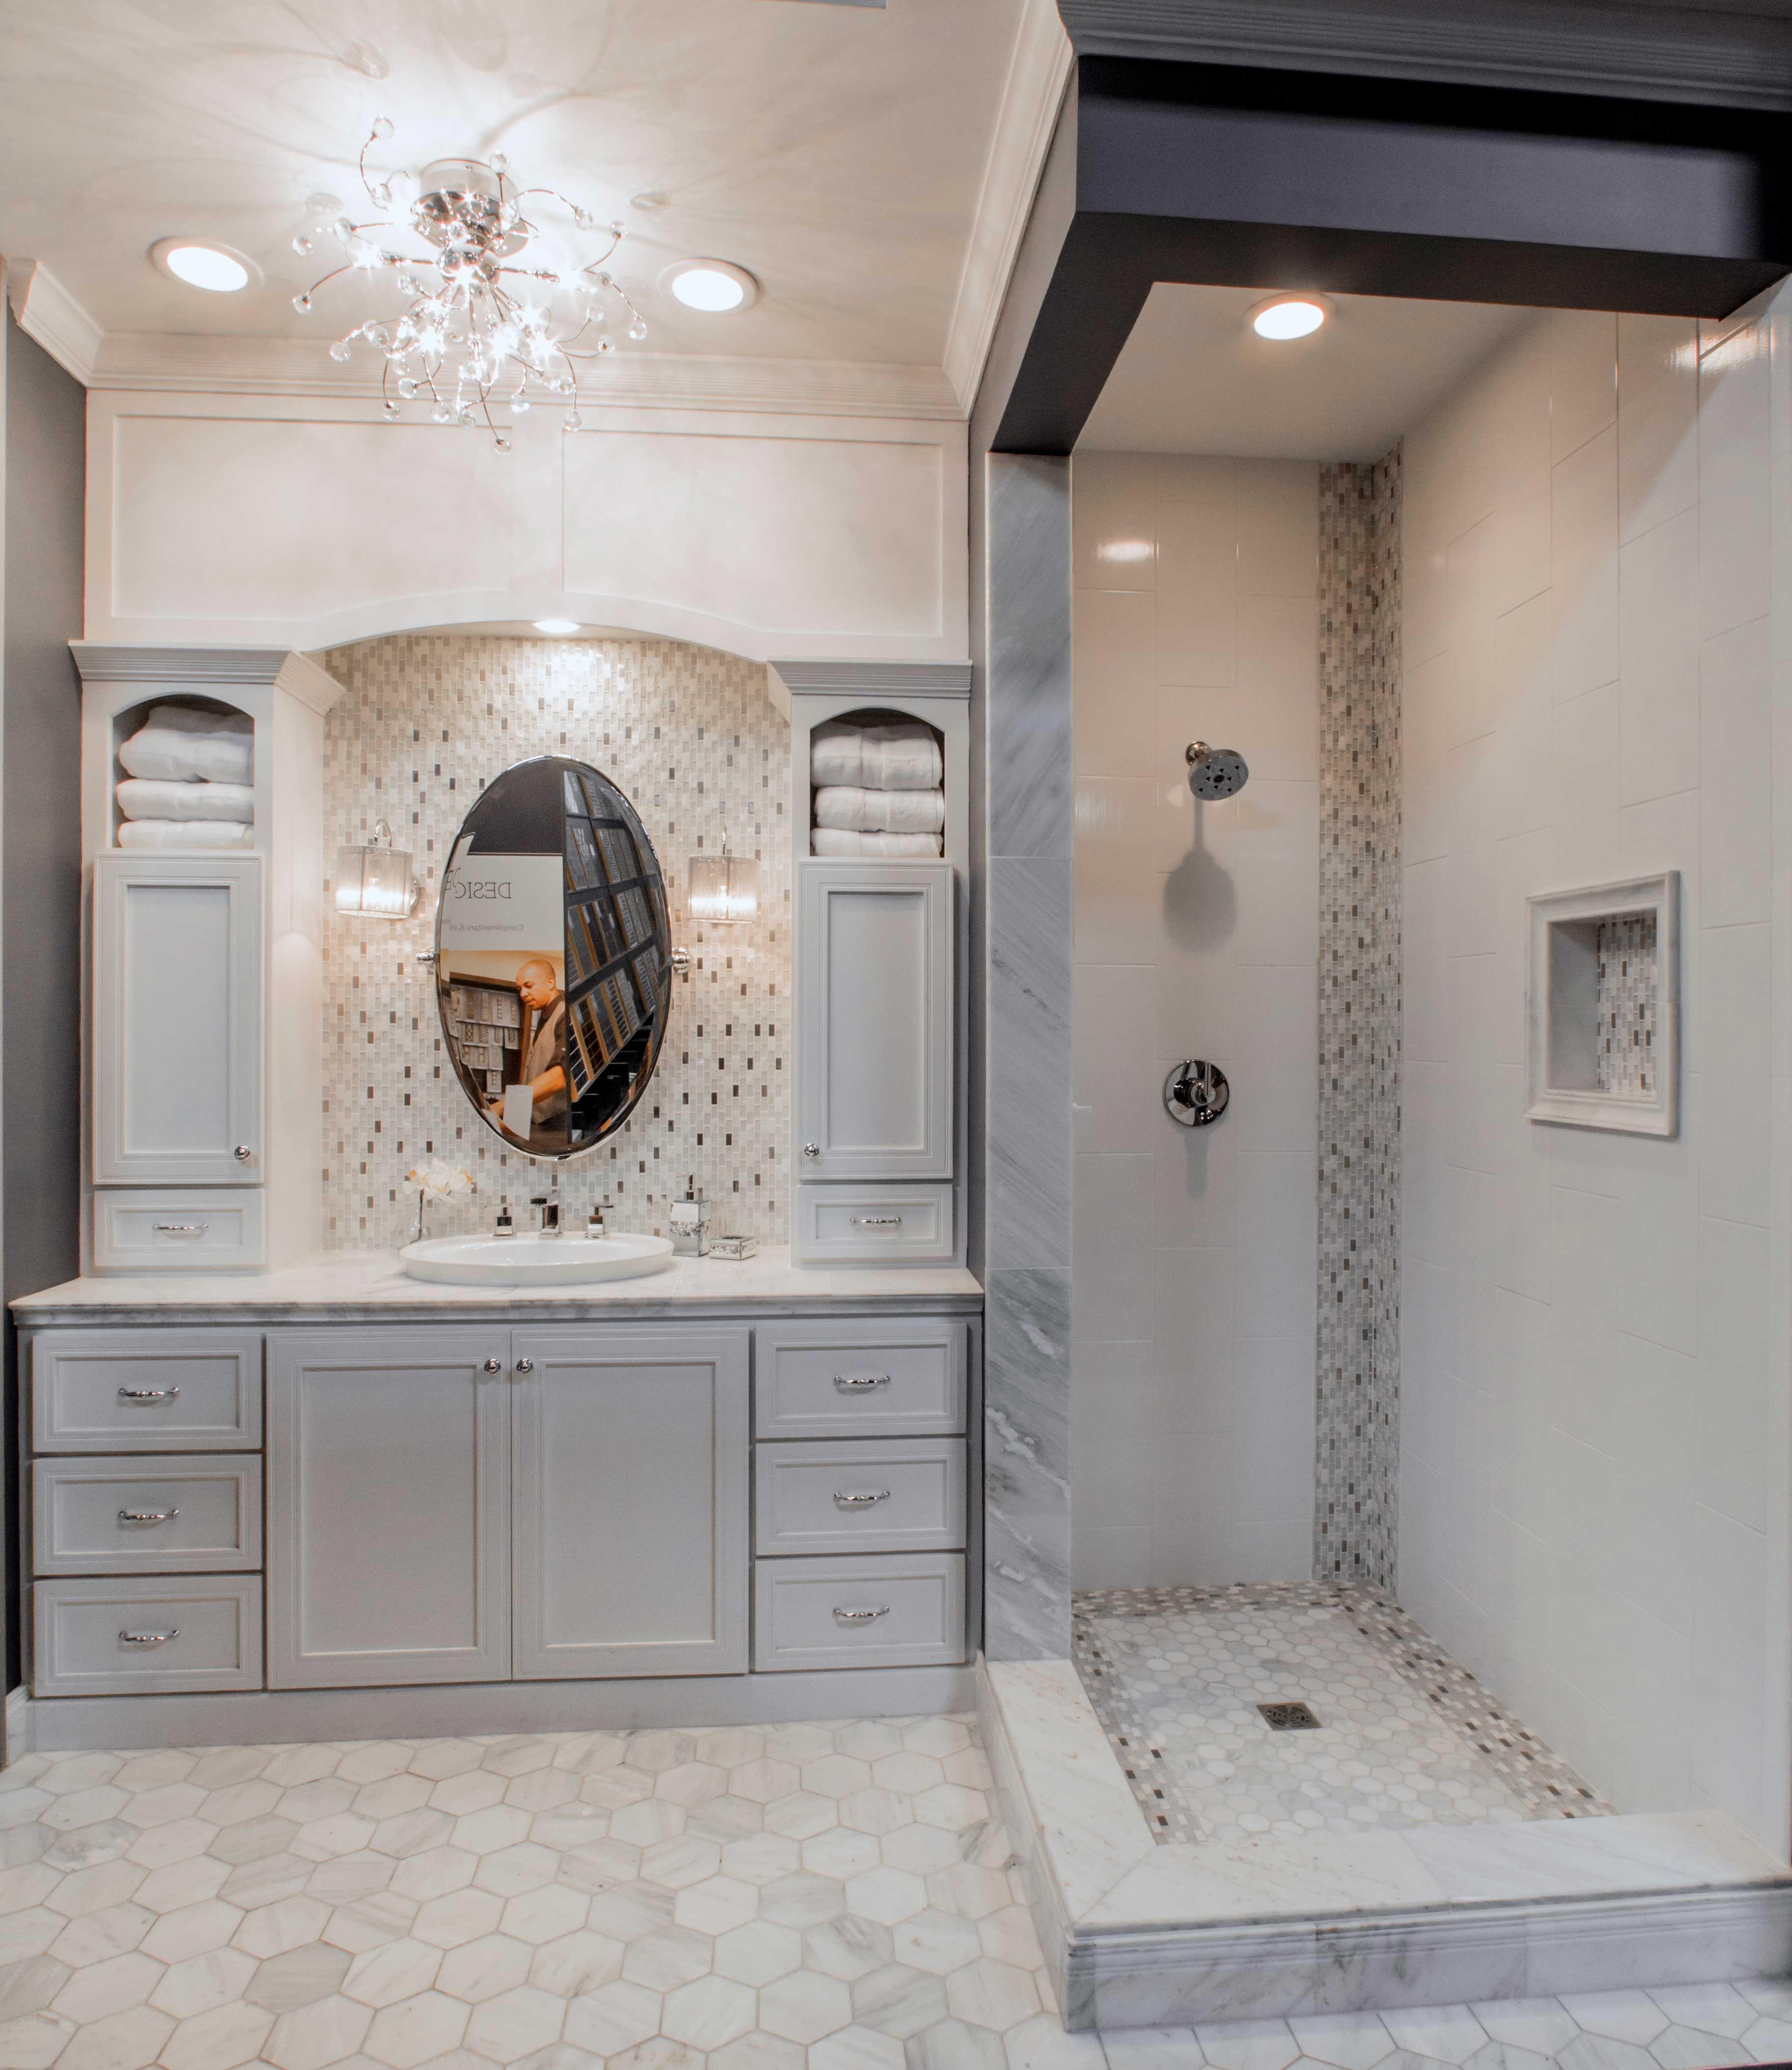 Website With Photo Gallery Elegant hexagon bathroom tile design Hampton Carrara Hex Marble Mosaic Tile https